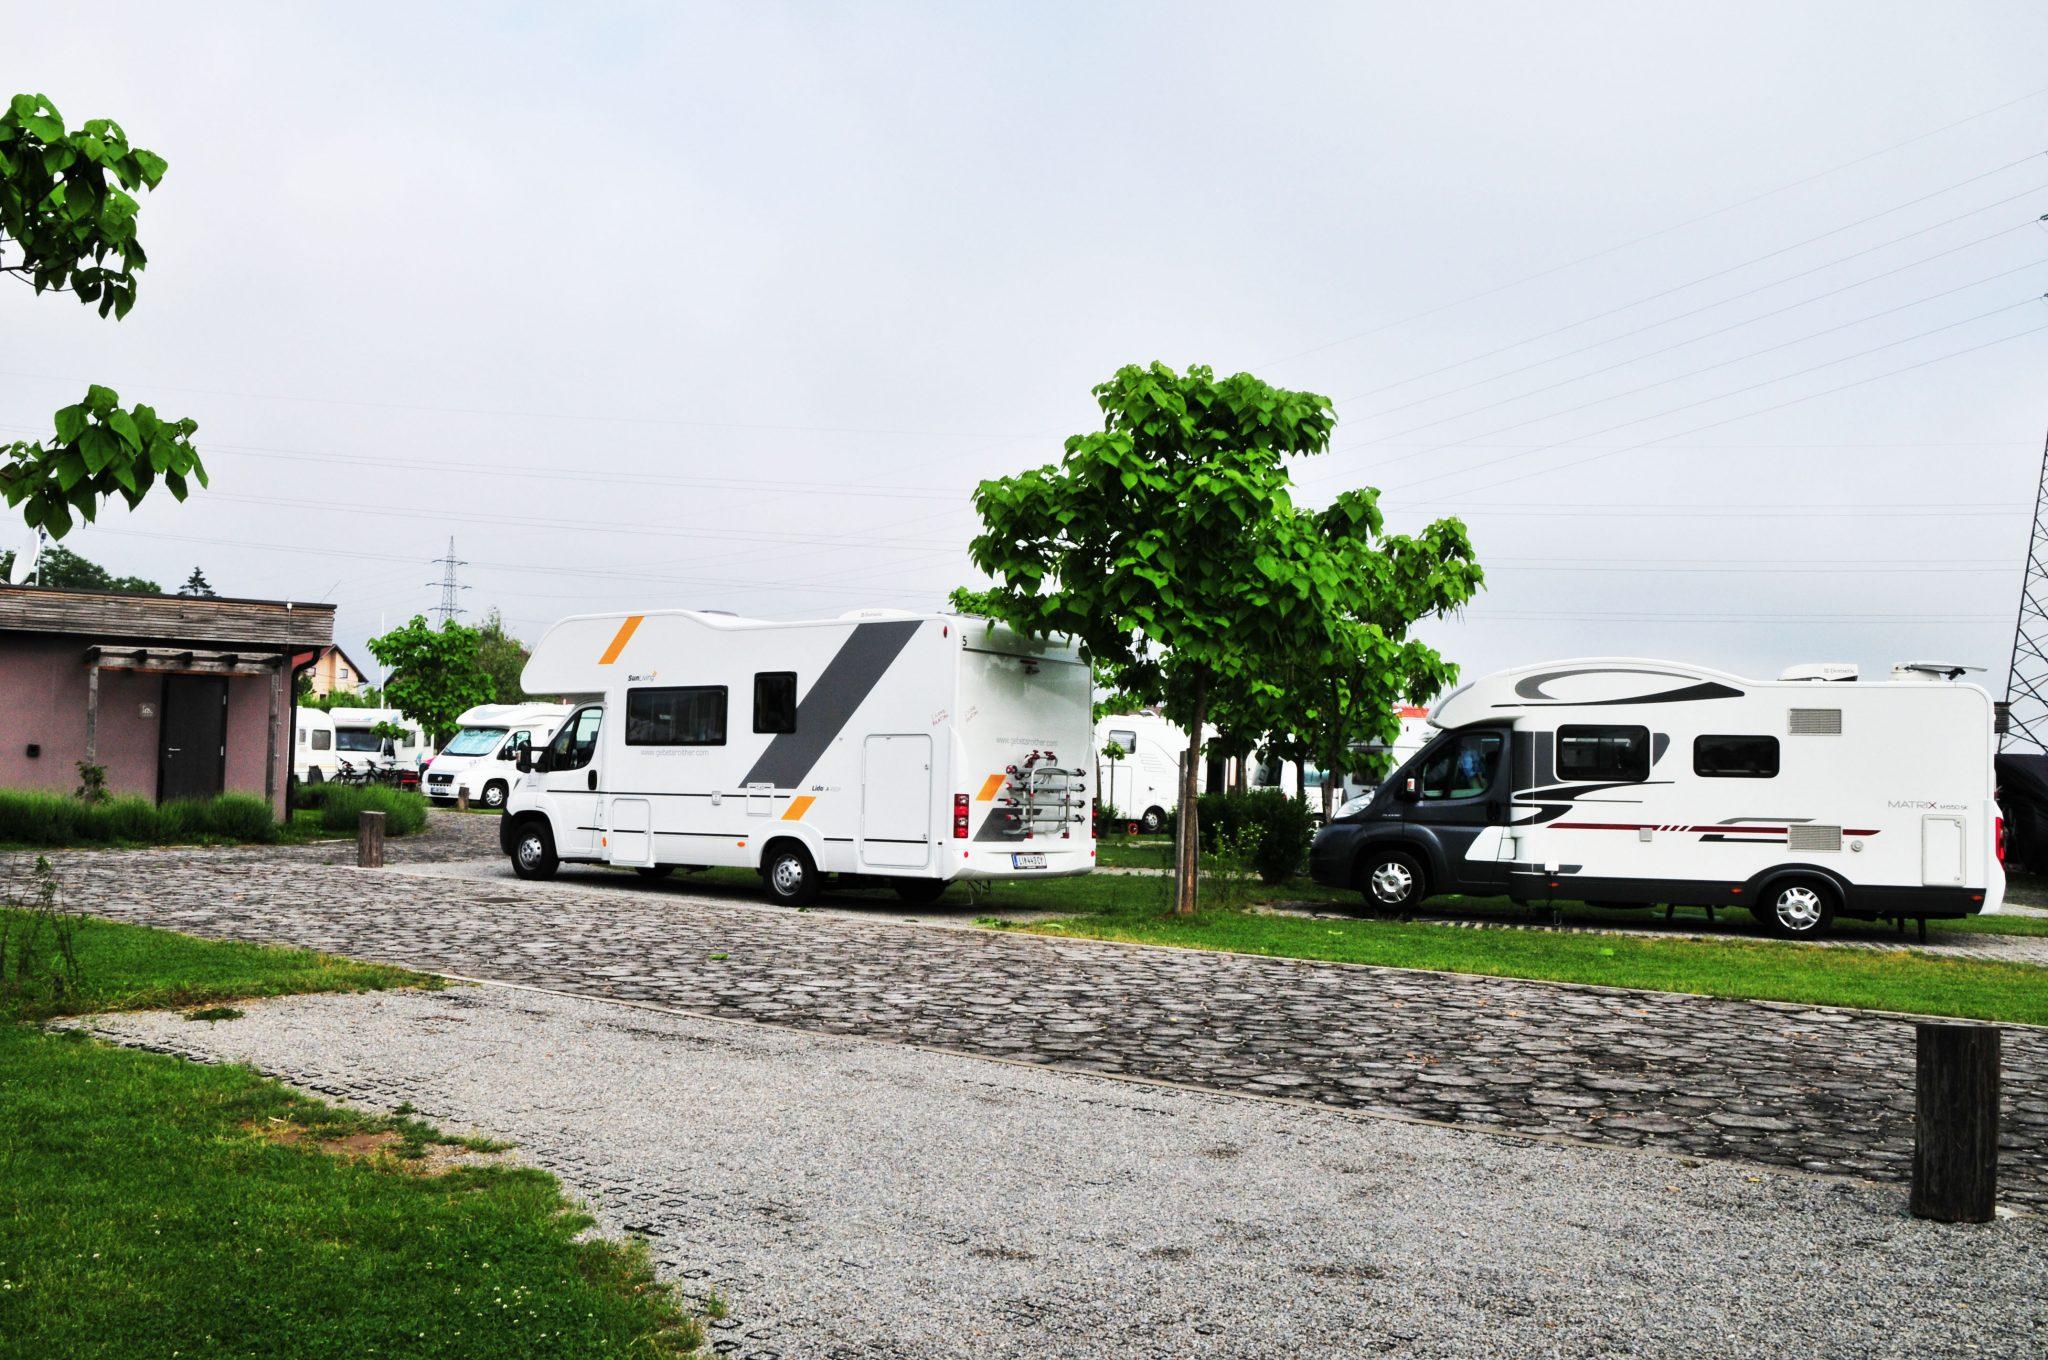 Camping Zagreb Gebetsroither Wohnmobil Kundenfahrt